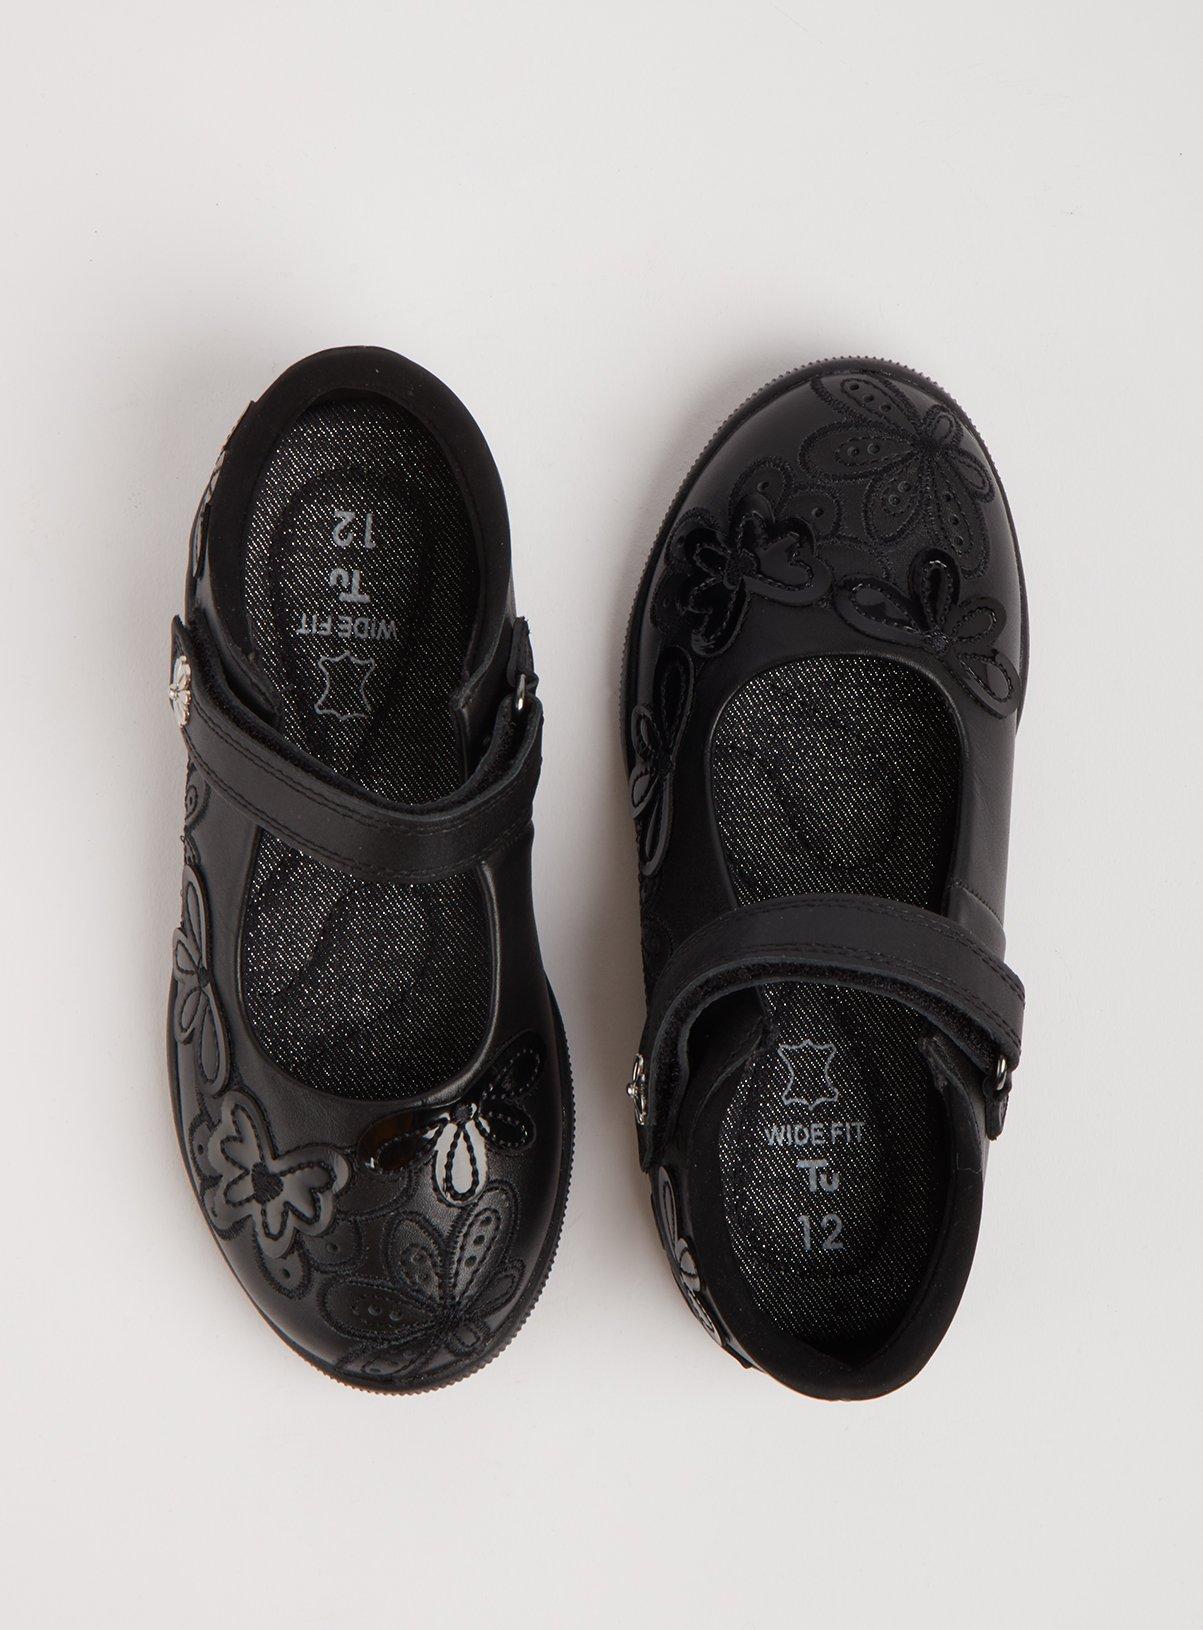 Black Leather Floral Strap Wide Fit School Shoes - 1